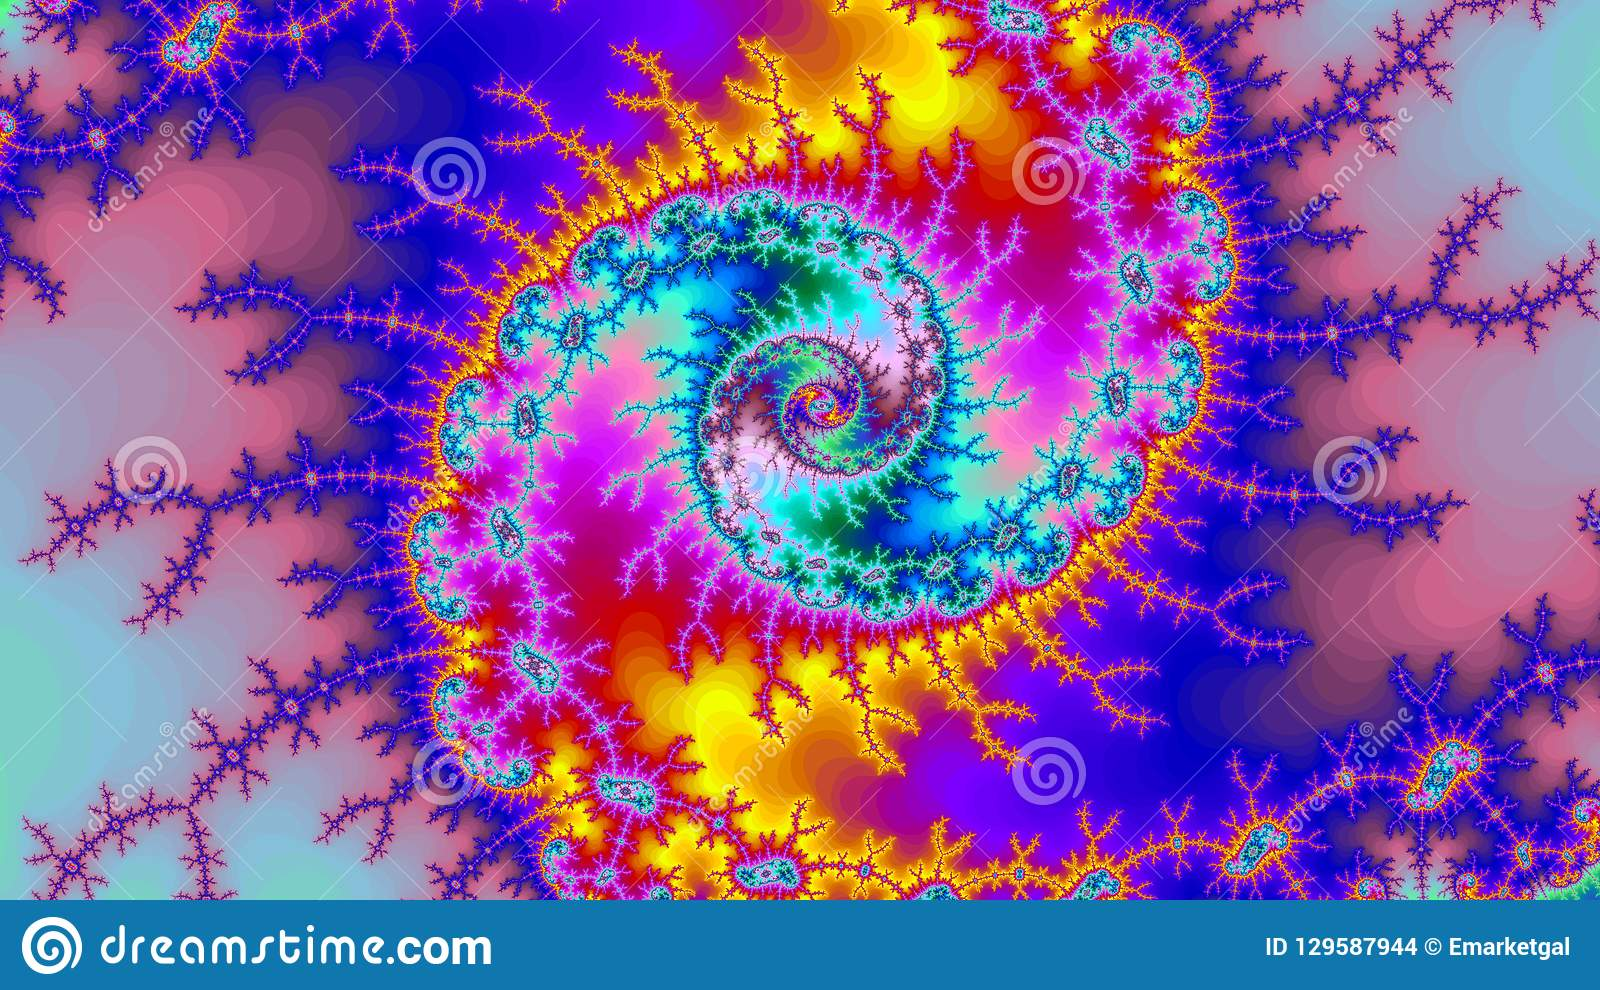 digital universe amazing abstract